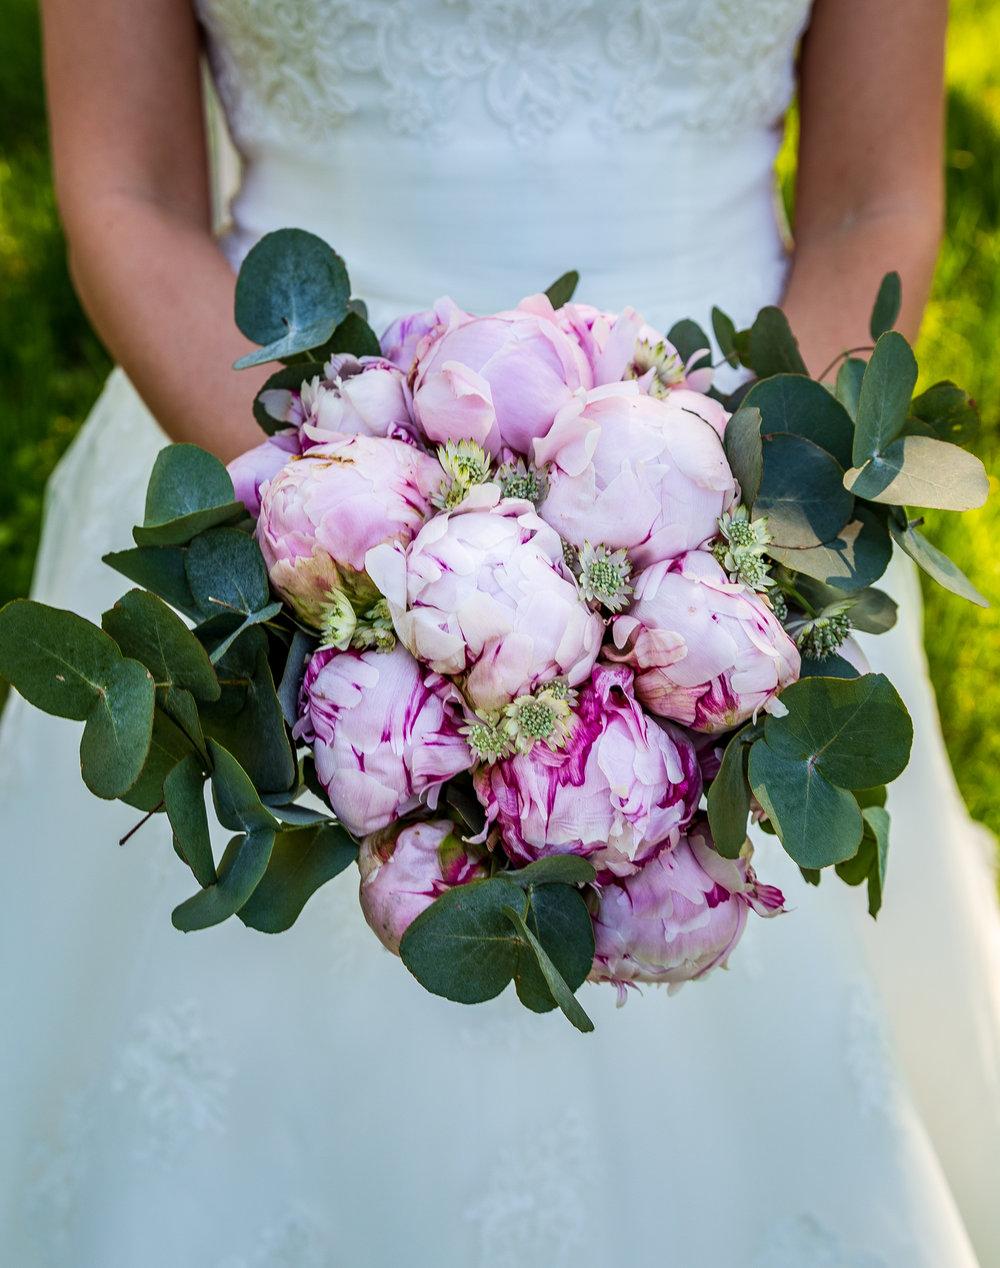 20180519-bröllop-fanny-daniel-422-2.jpg